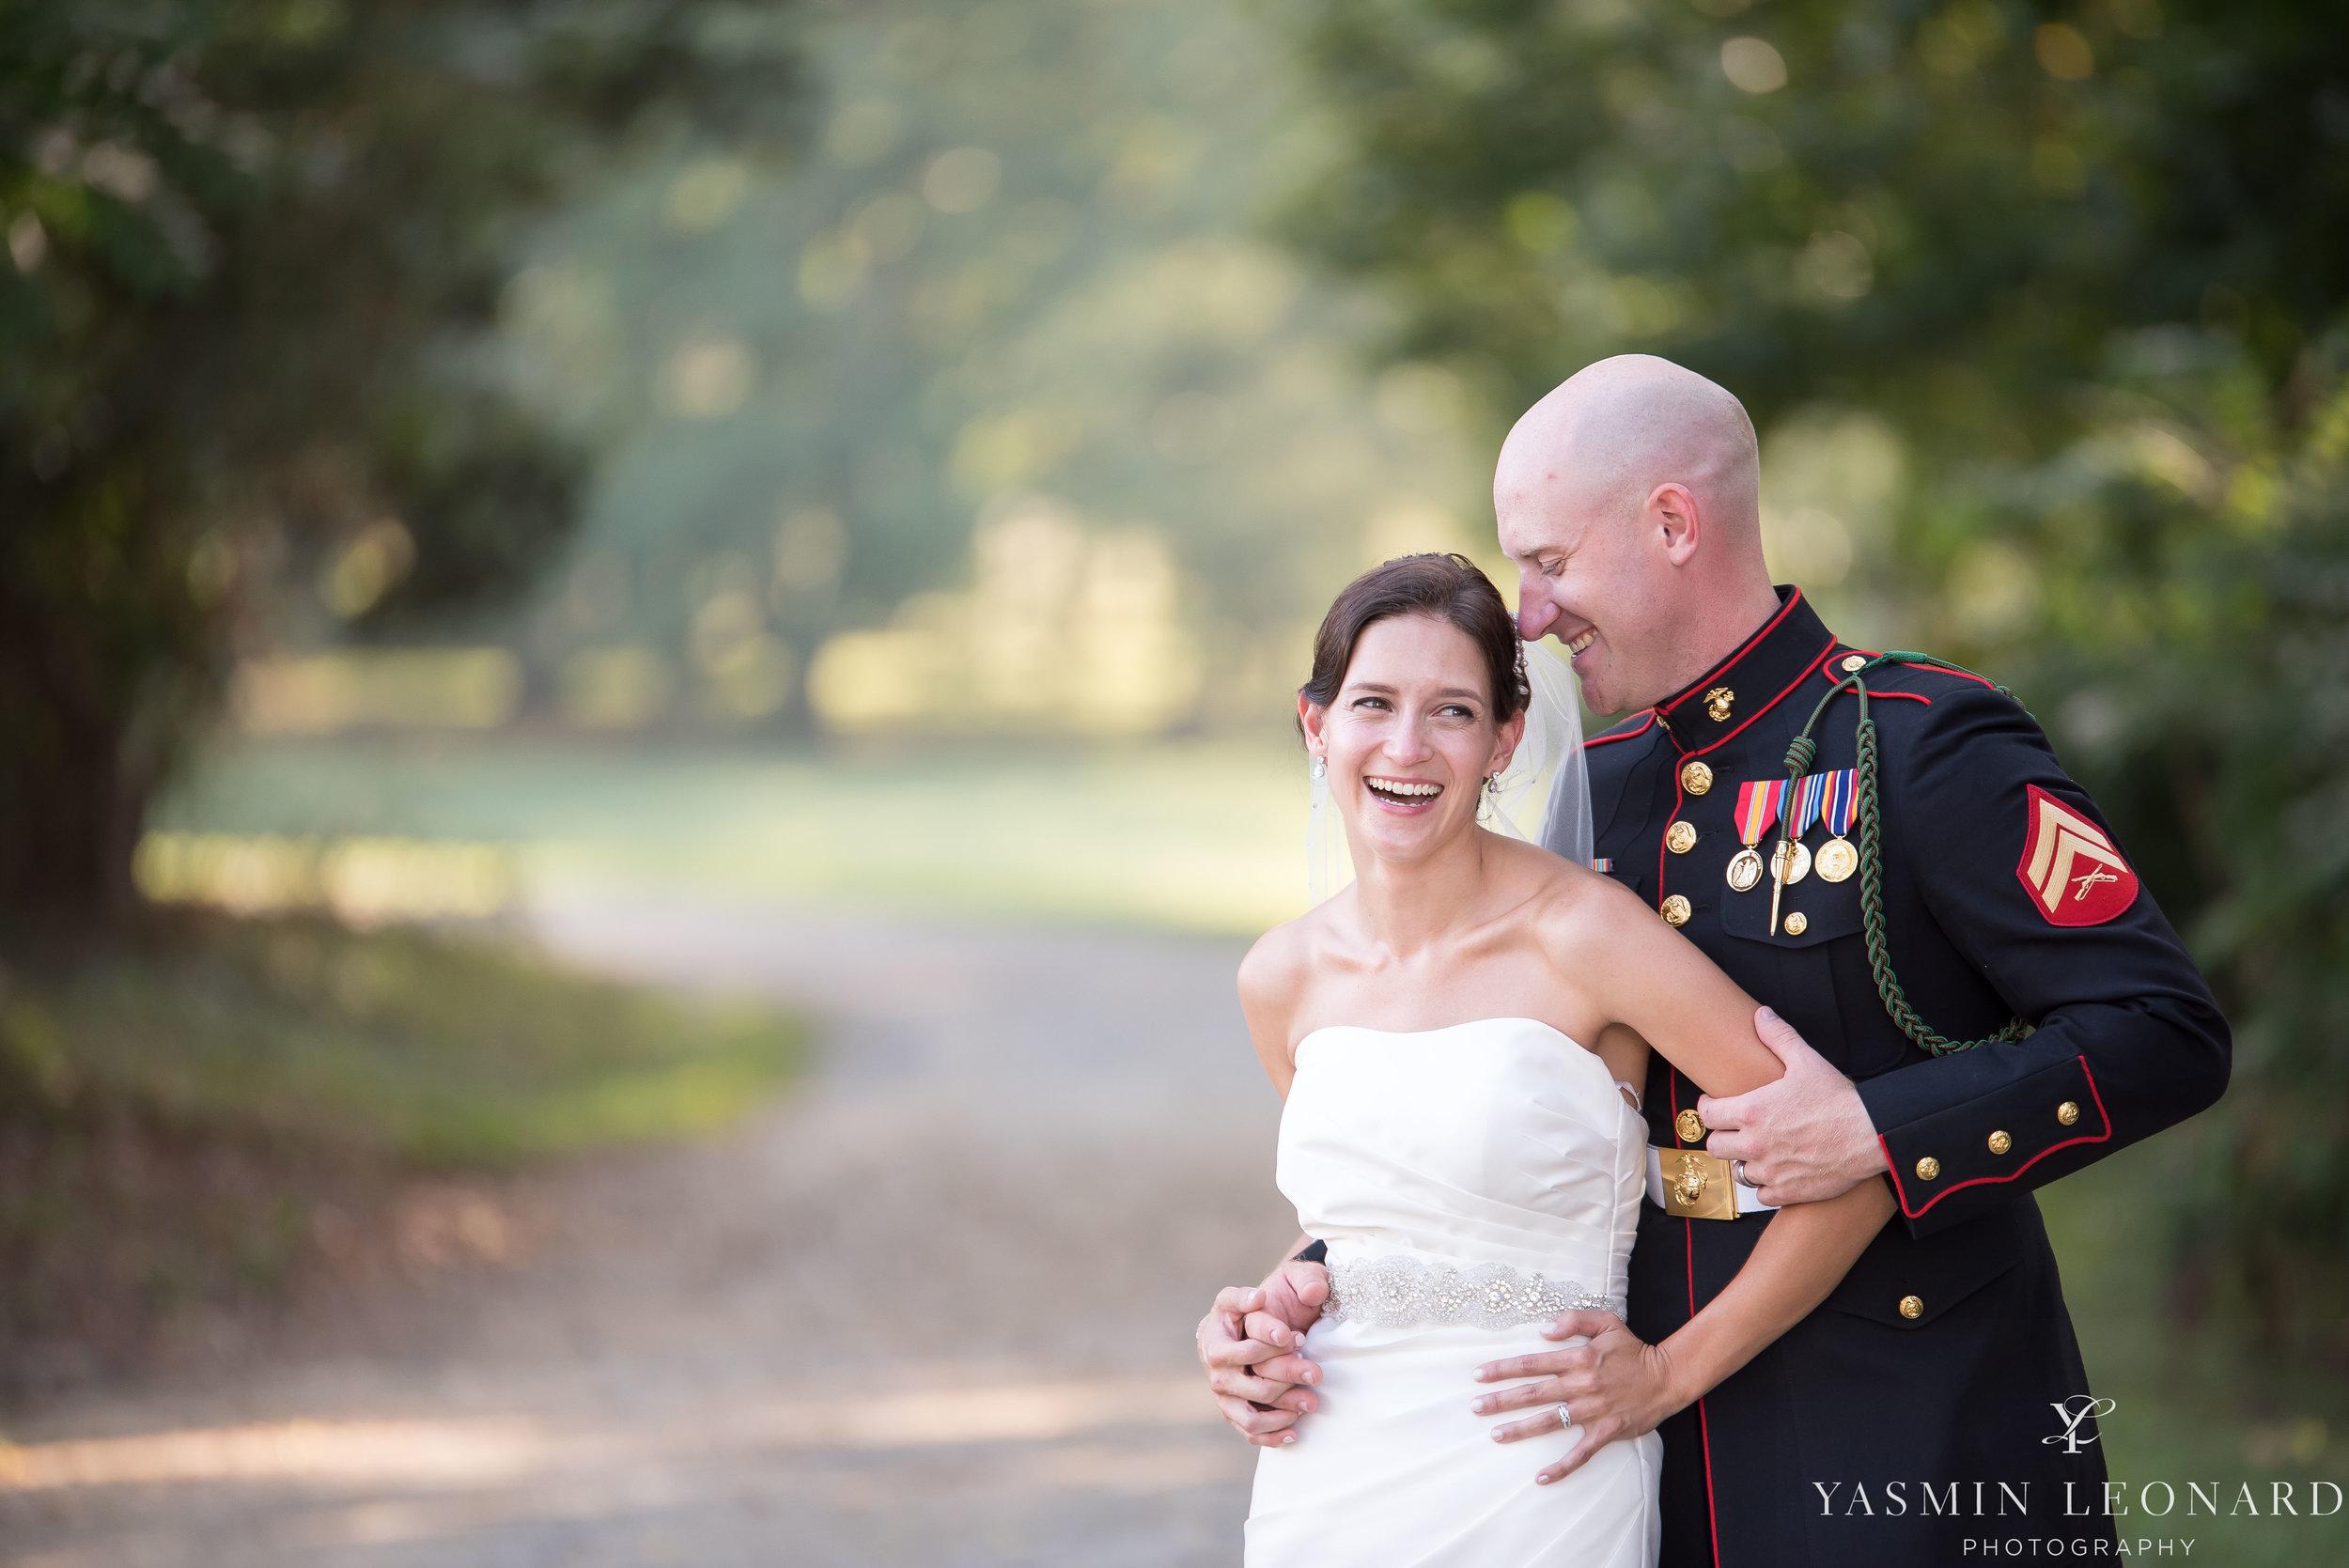 Sara and Nathan | Summerfield Farms | Yasmin Leonard Photography-51.jpg